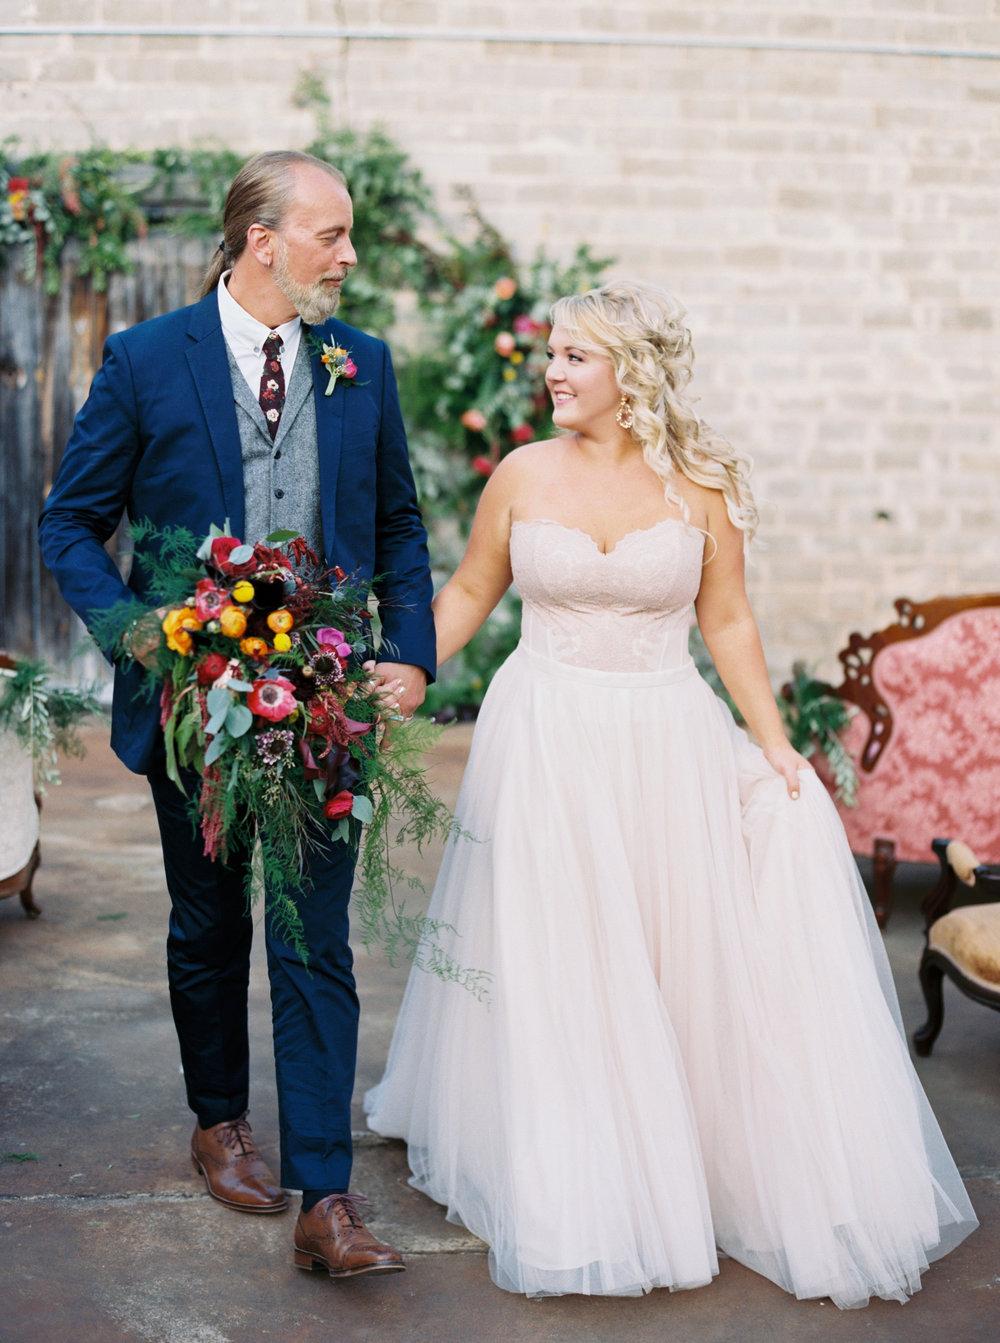 Mandi_Oliver_Chattanooga_Wedding_Abigail_Malone_Photography_Film-261.jpg